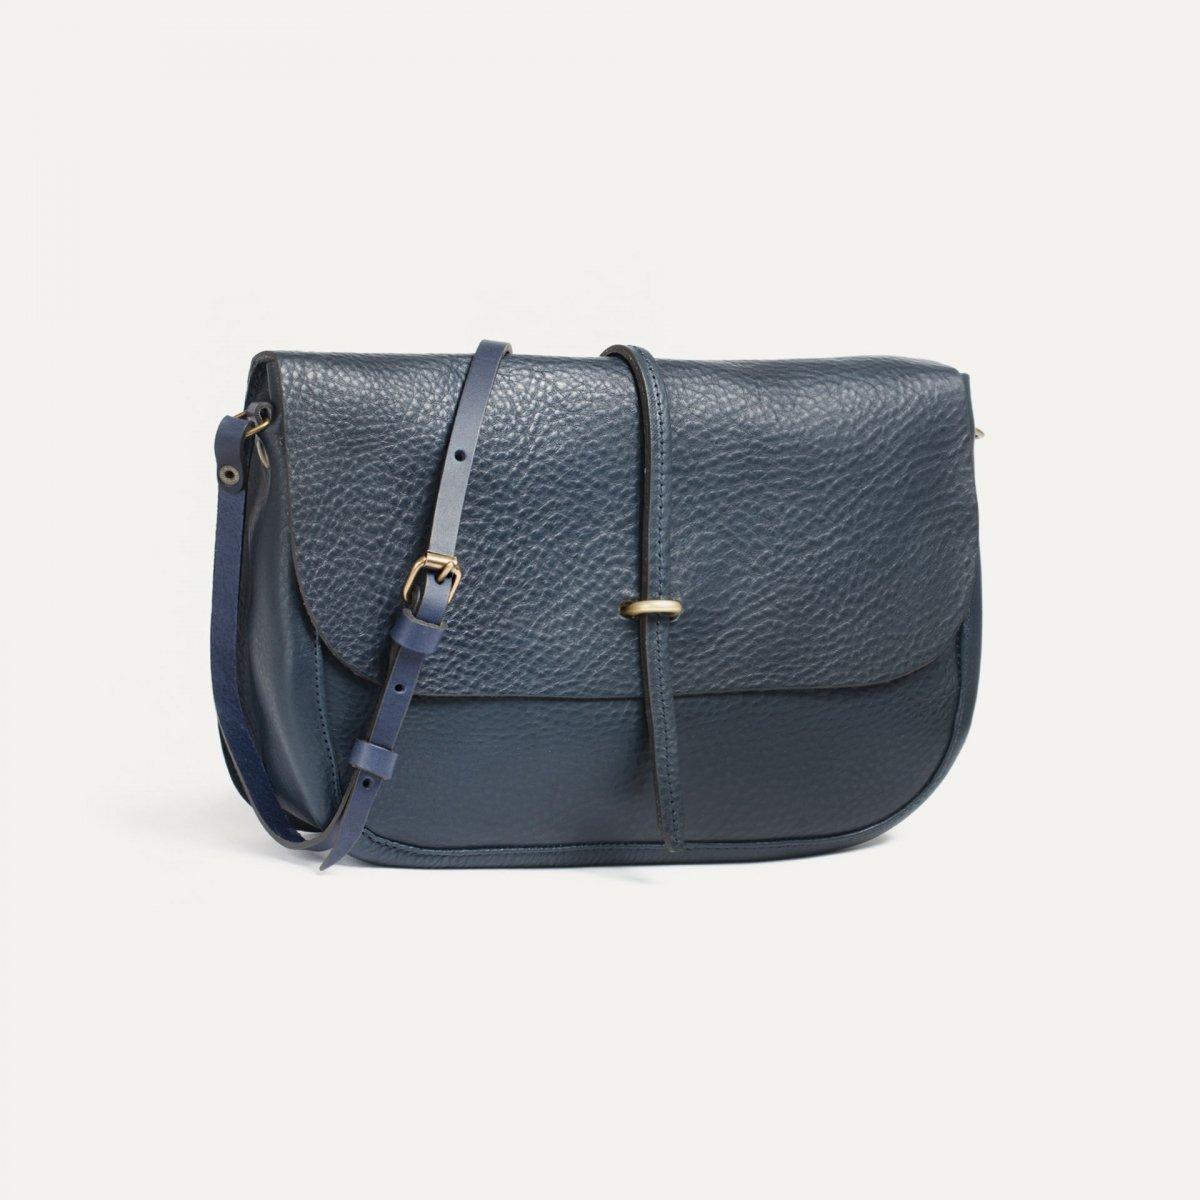 Pastis handbag - Navy Blue (image n°2)